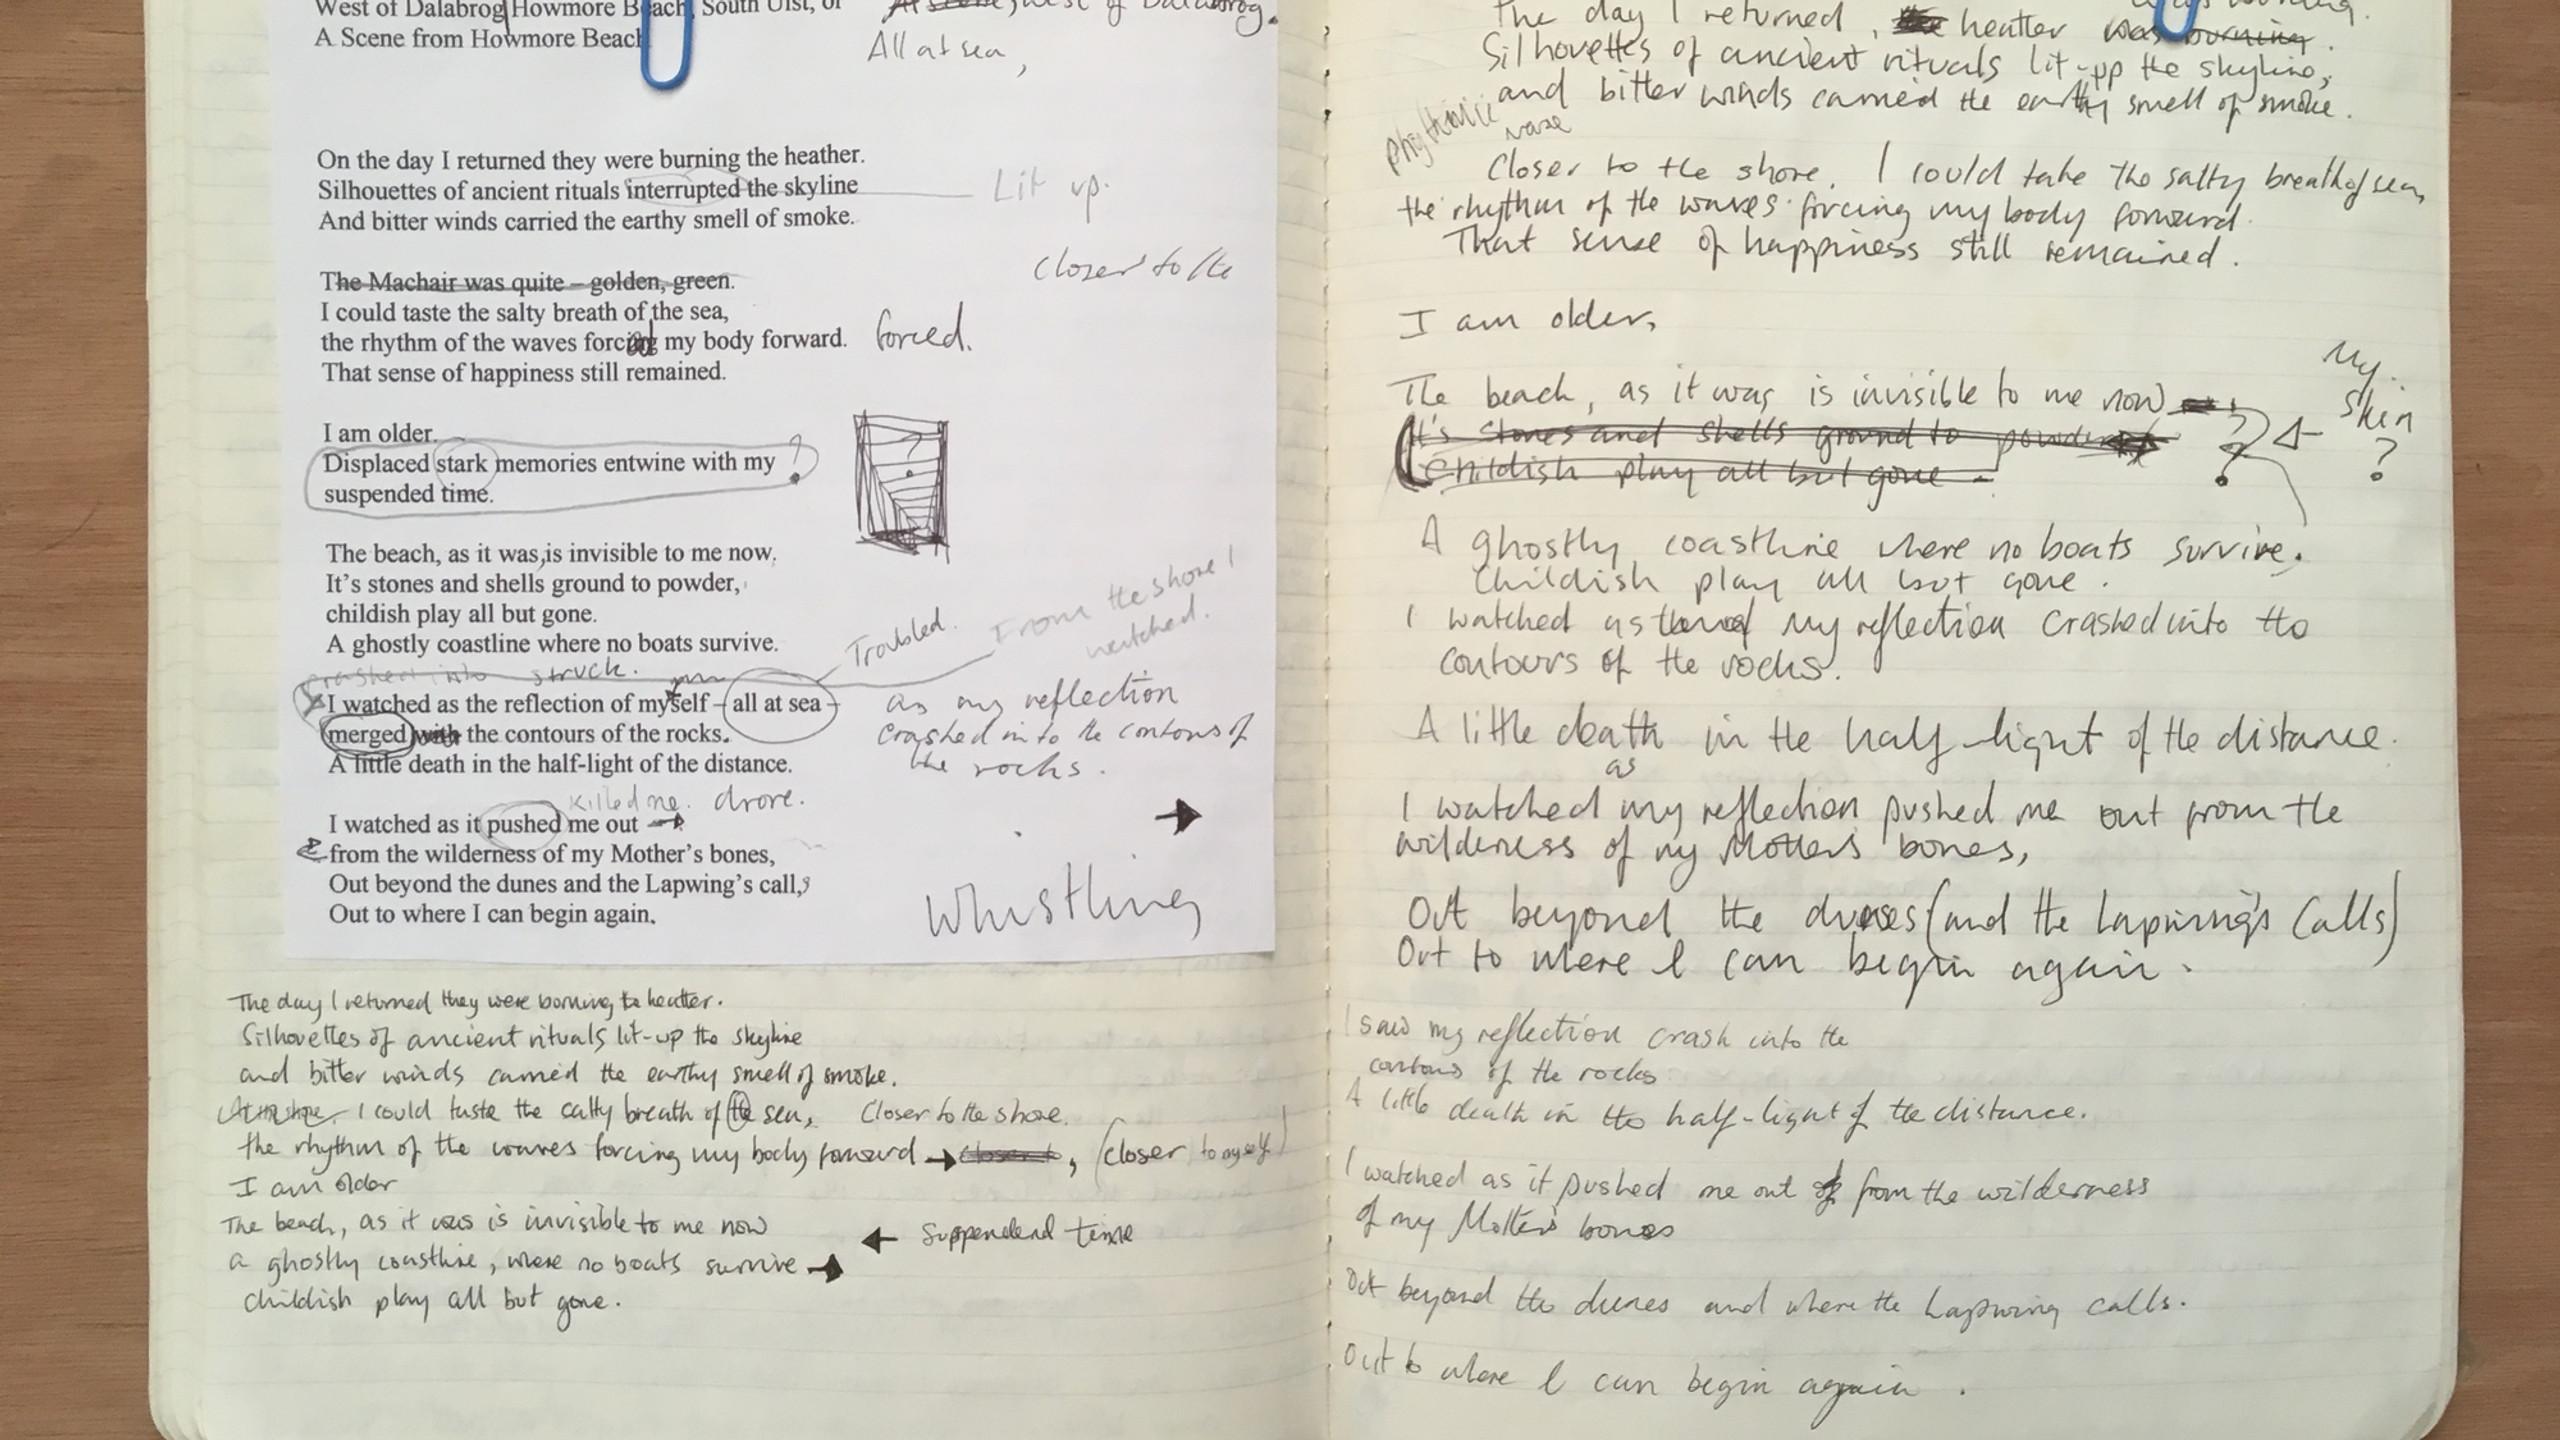 Writing 'West of Dalabrog'